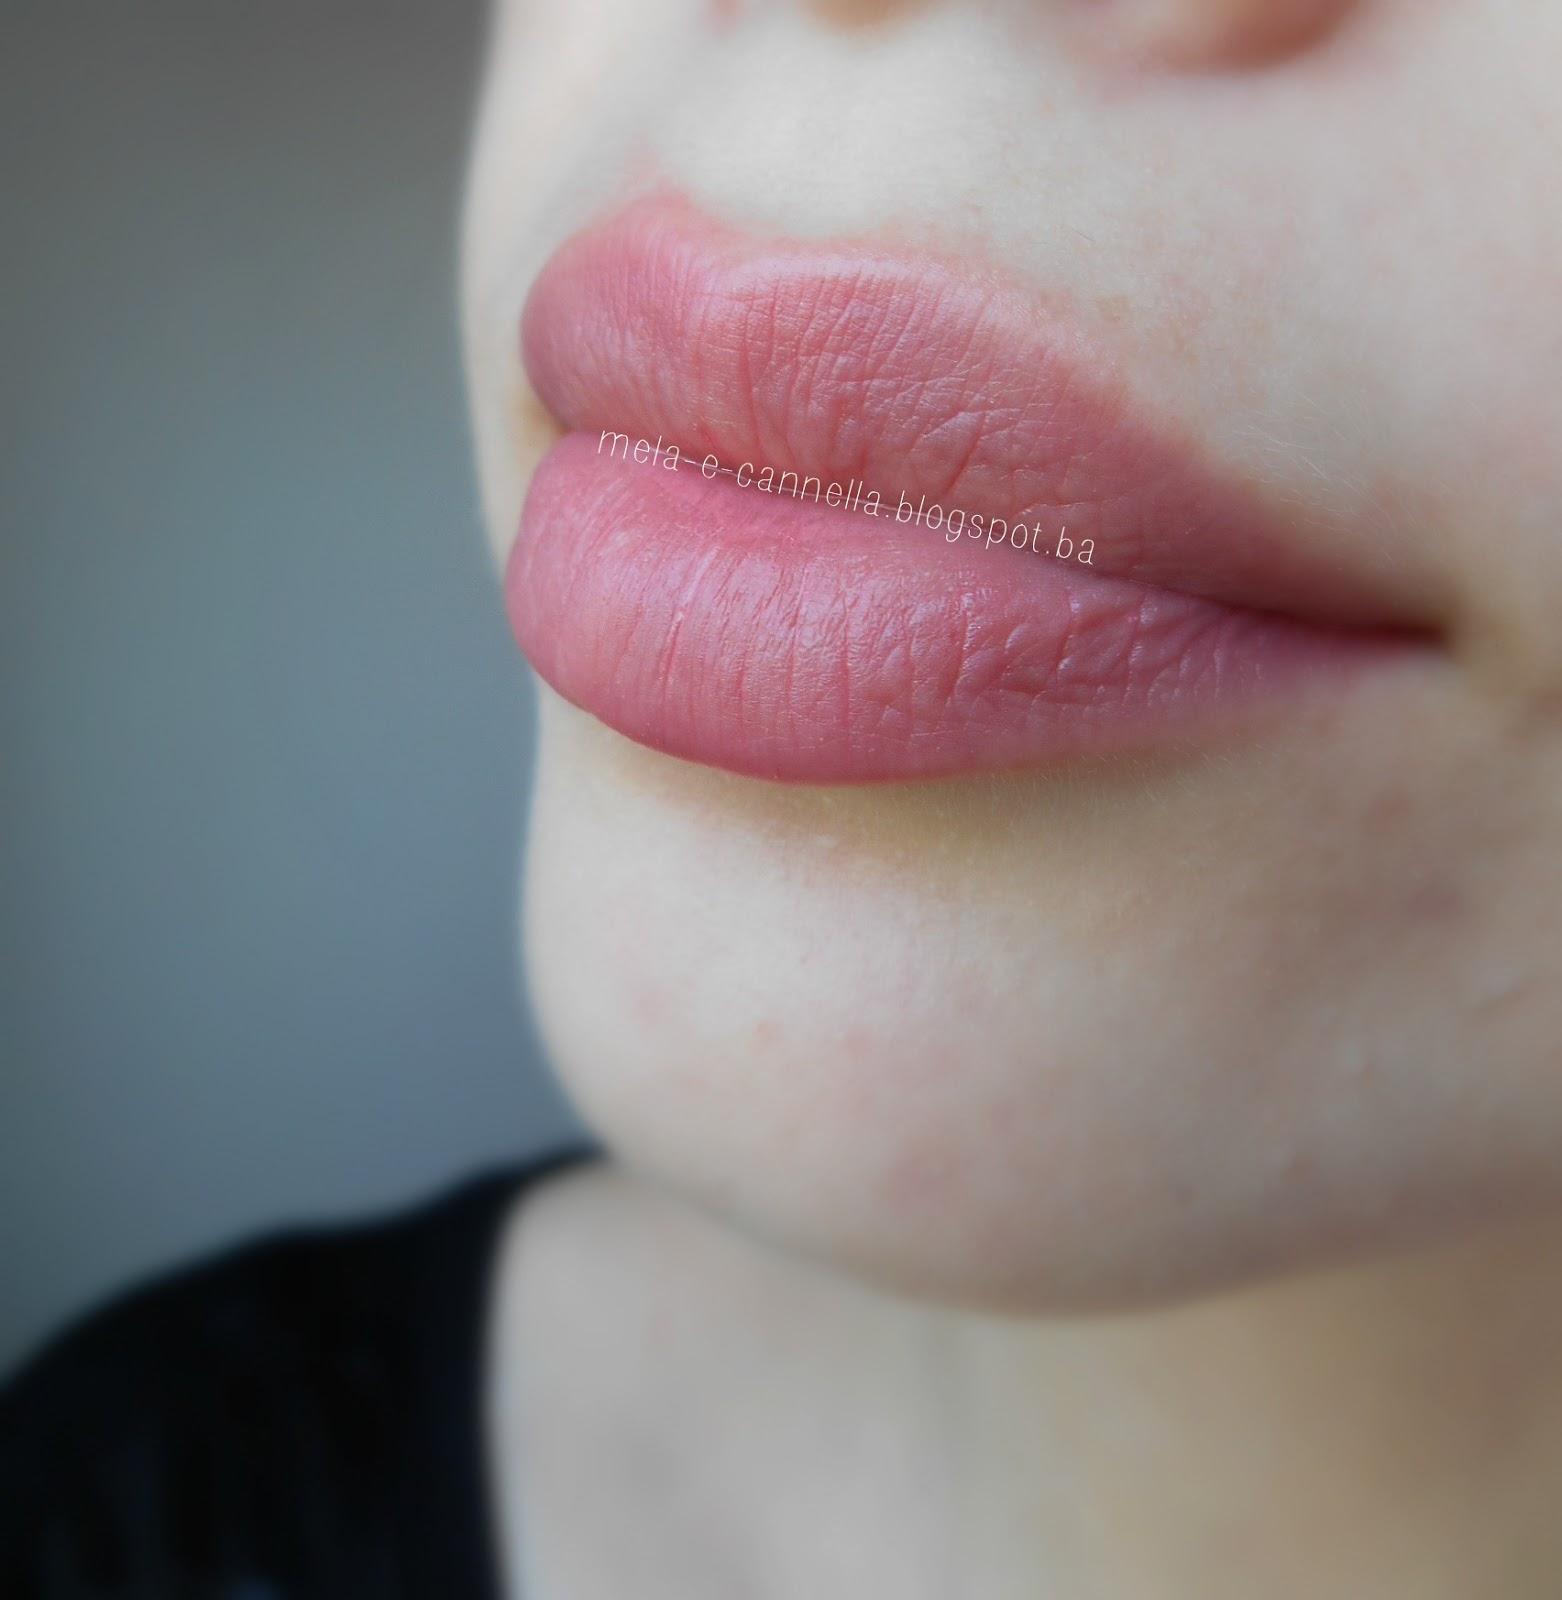 Mela E Cannella Avon Shine Burst Lipstick Rose